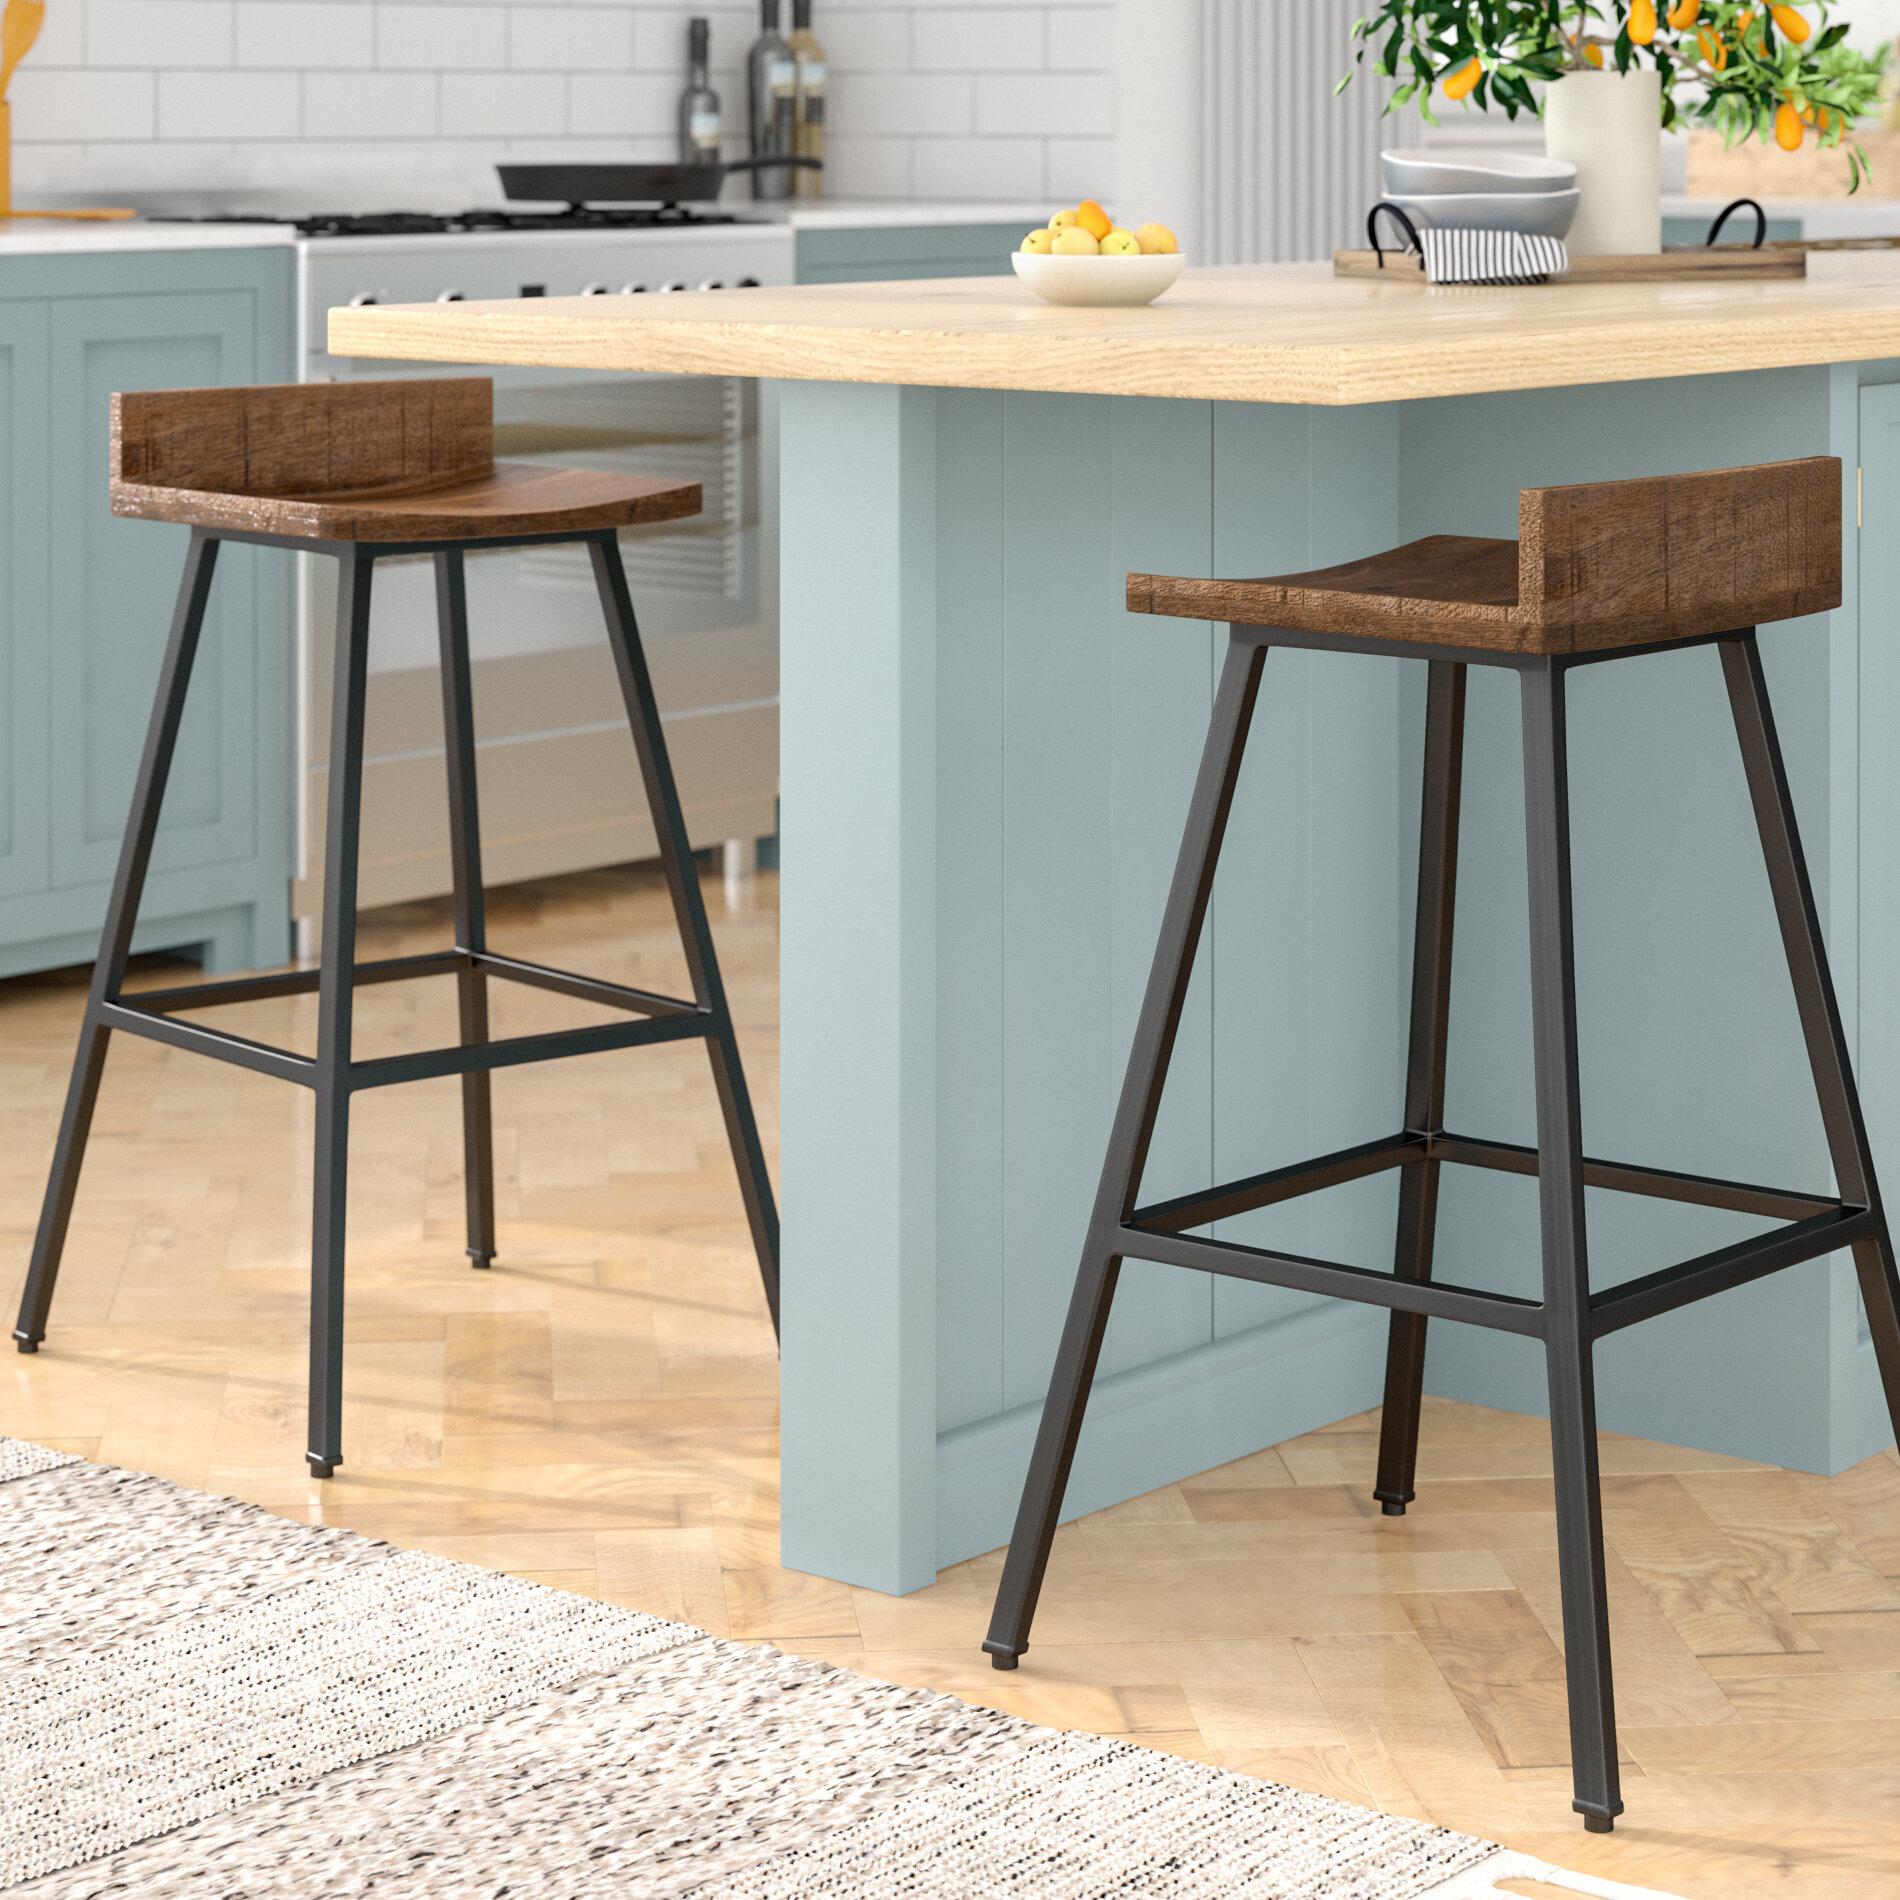 Swell Laurel Foundry Modern Farmhouse Gracie 27 Bar Stool Machost Co Dining Chair Design Ideas Machostcouk